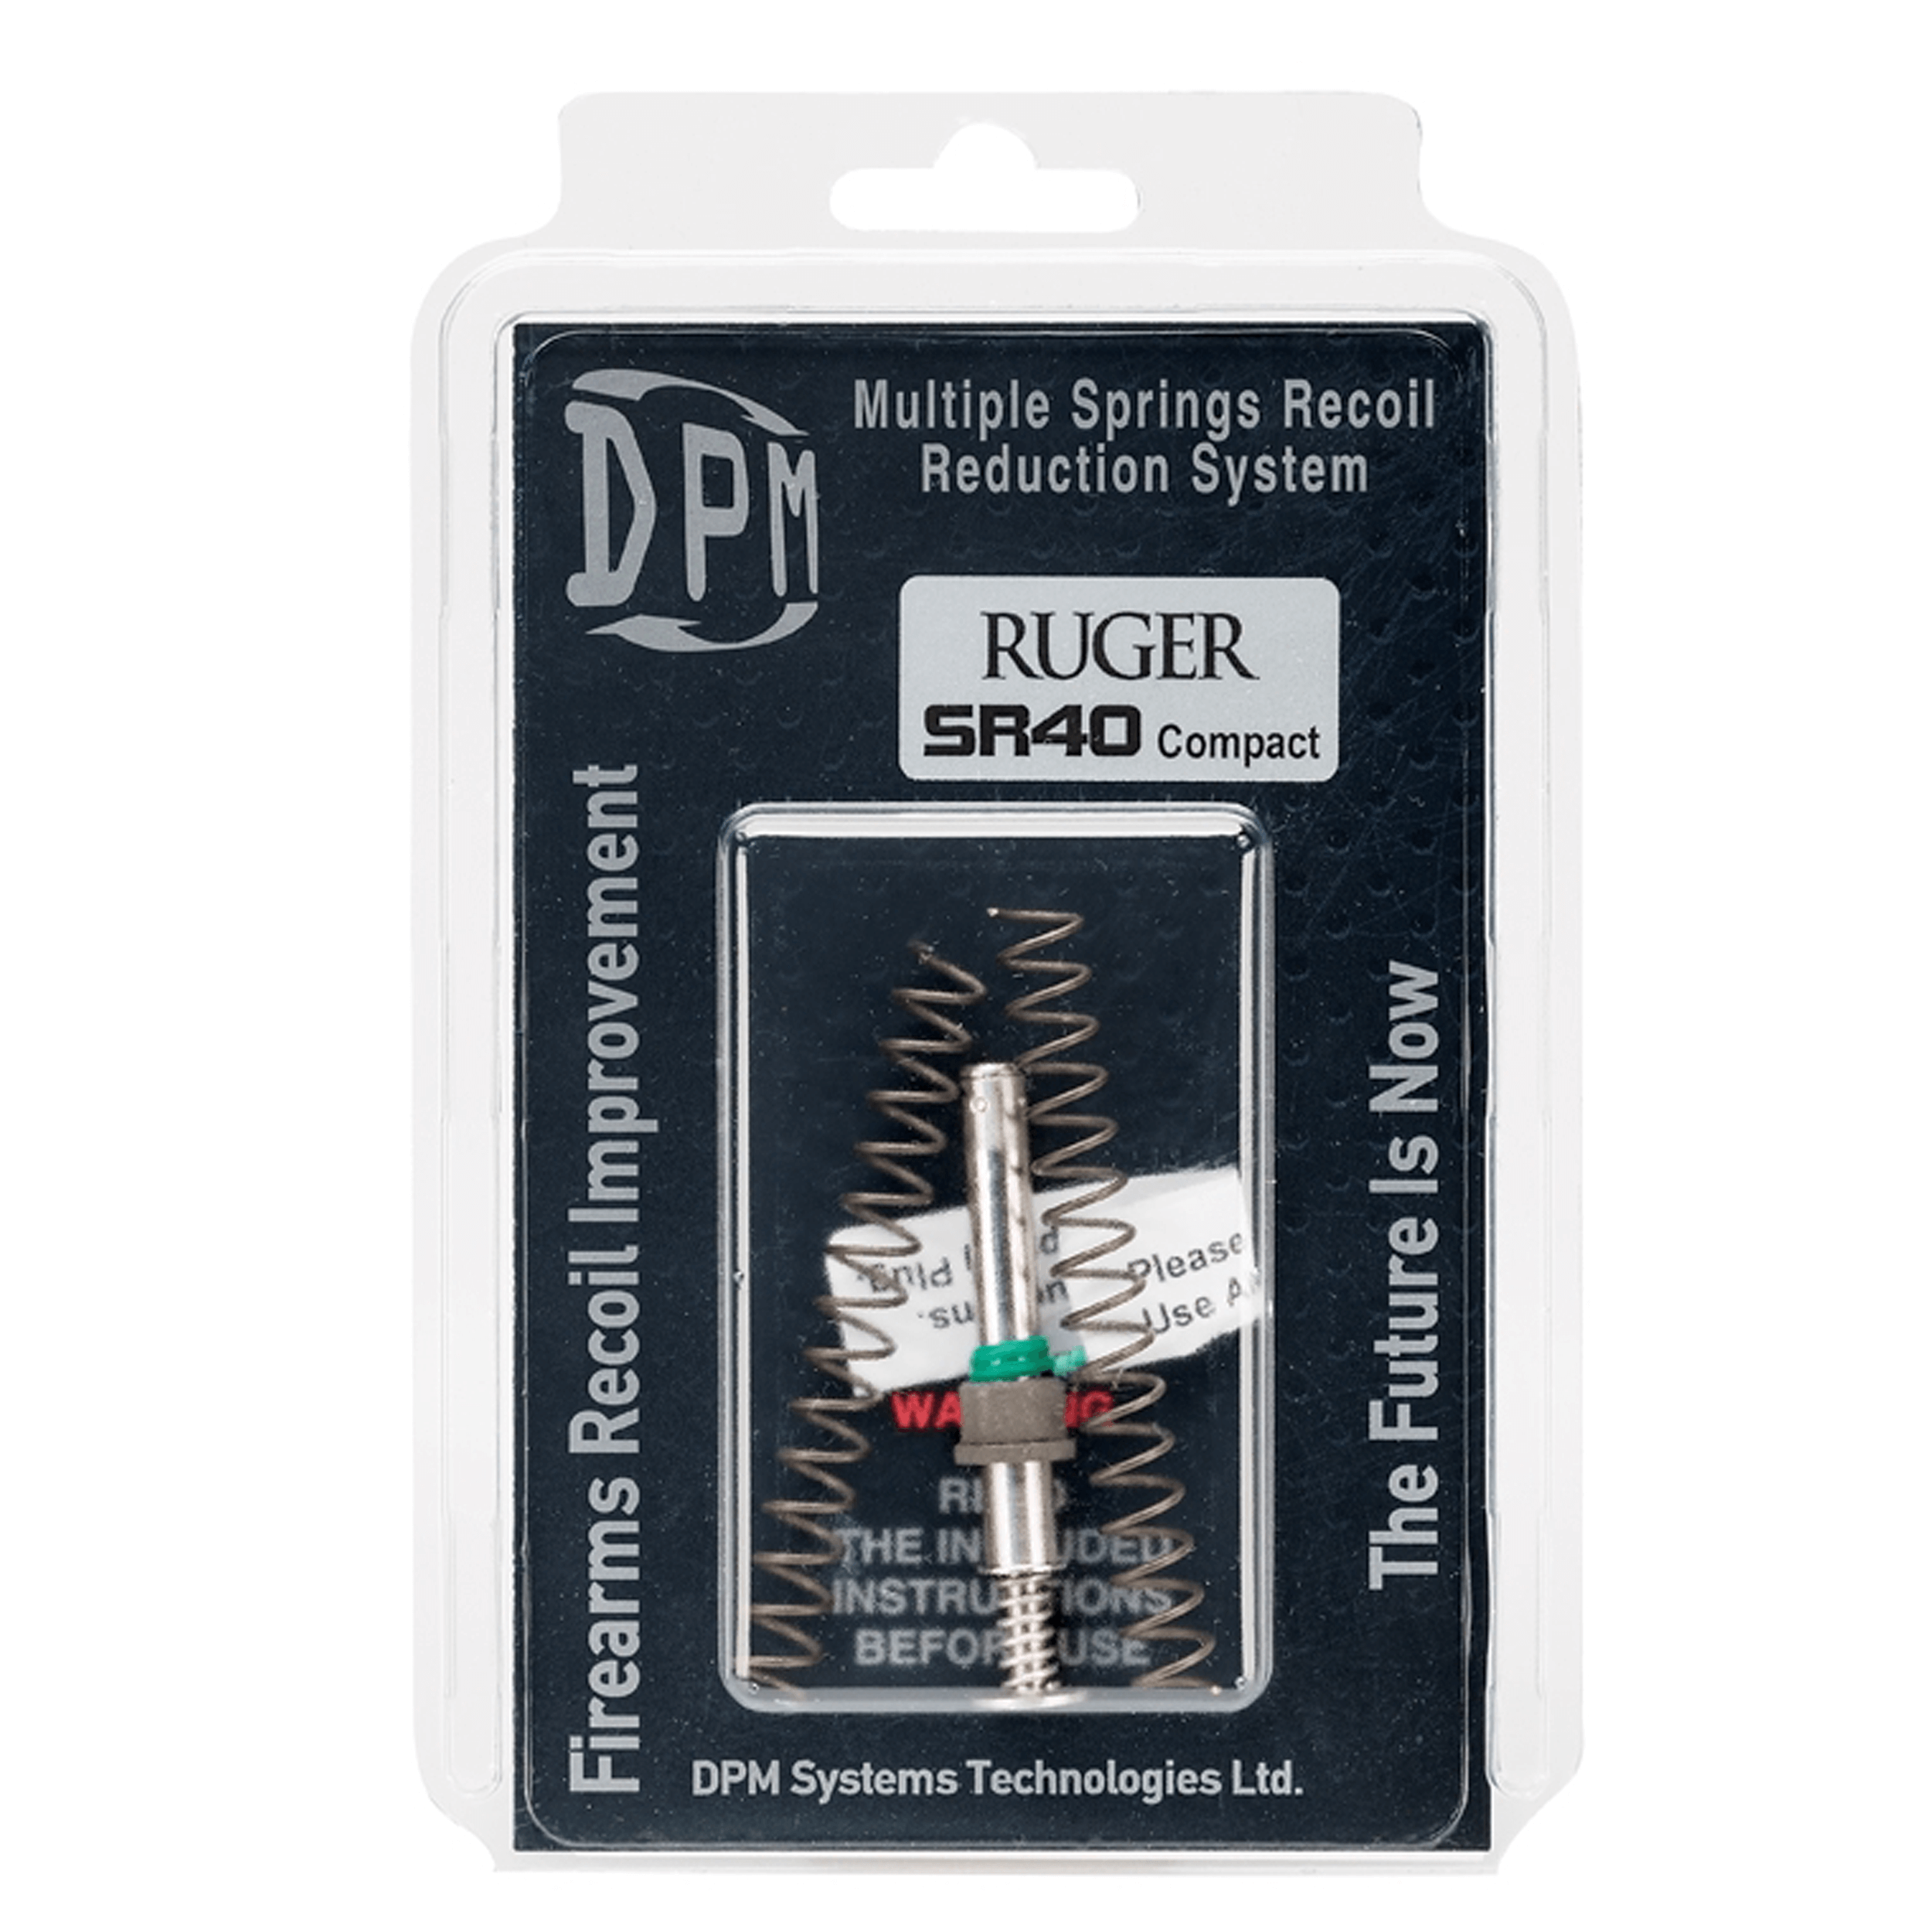 Ruger SR 40 - Compact